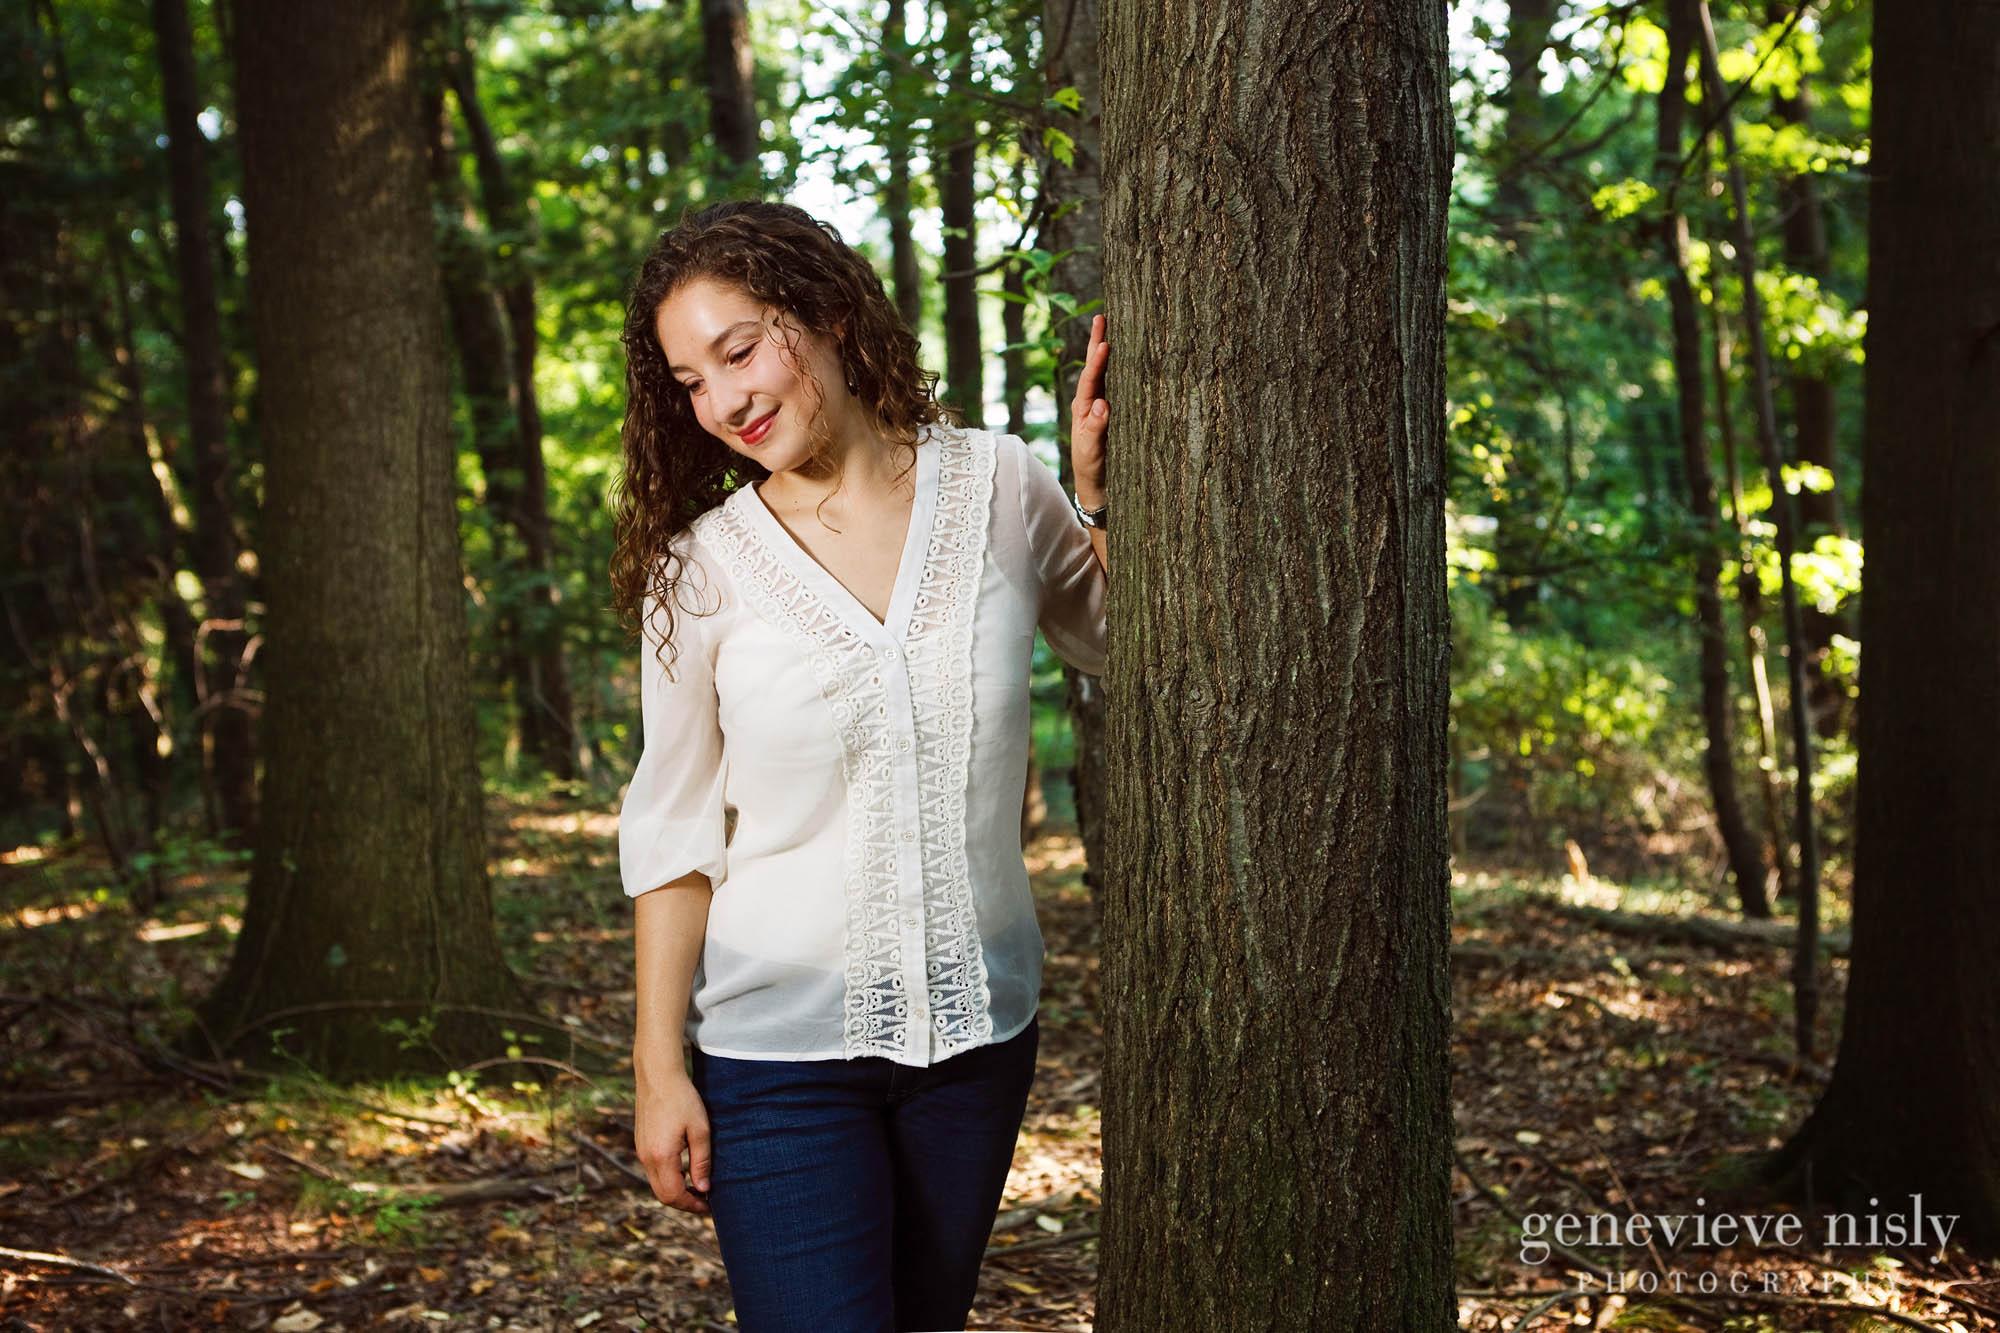 Copyright Genevieve Nisly Photography, Portraits